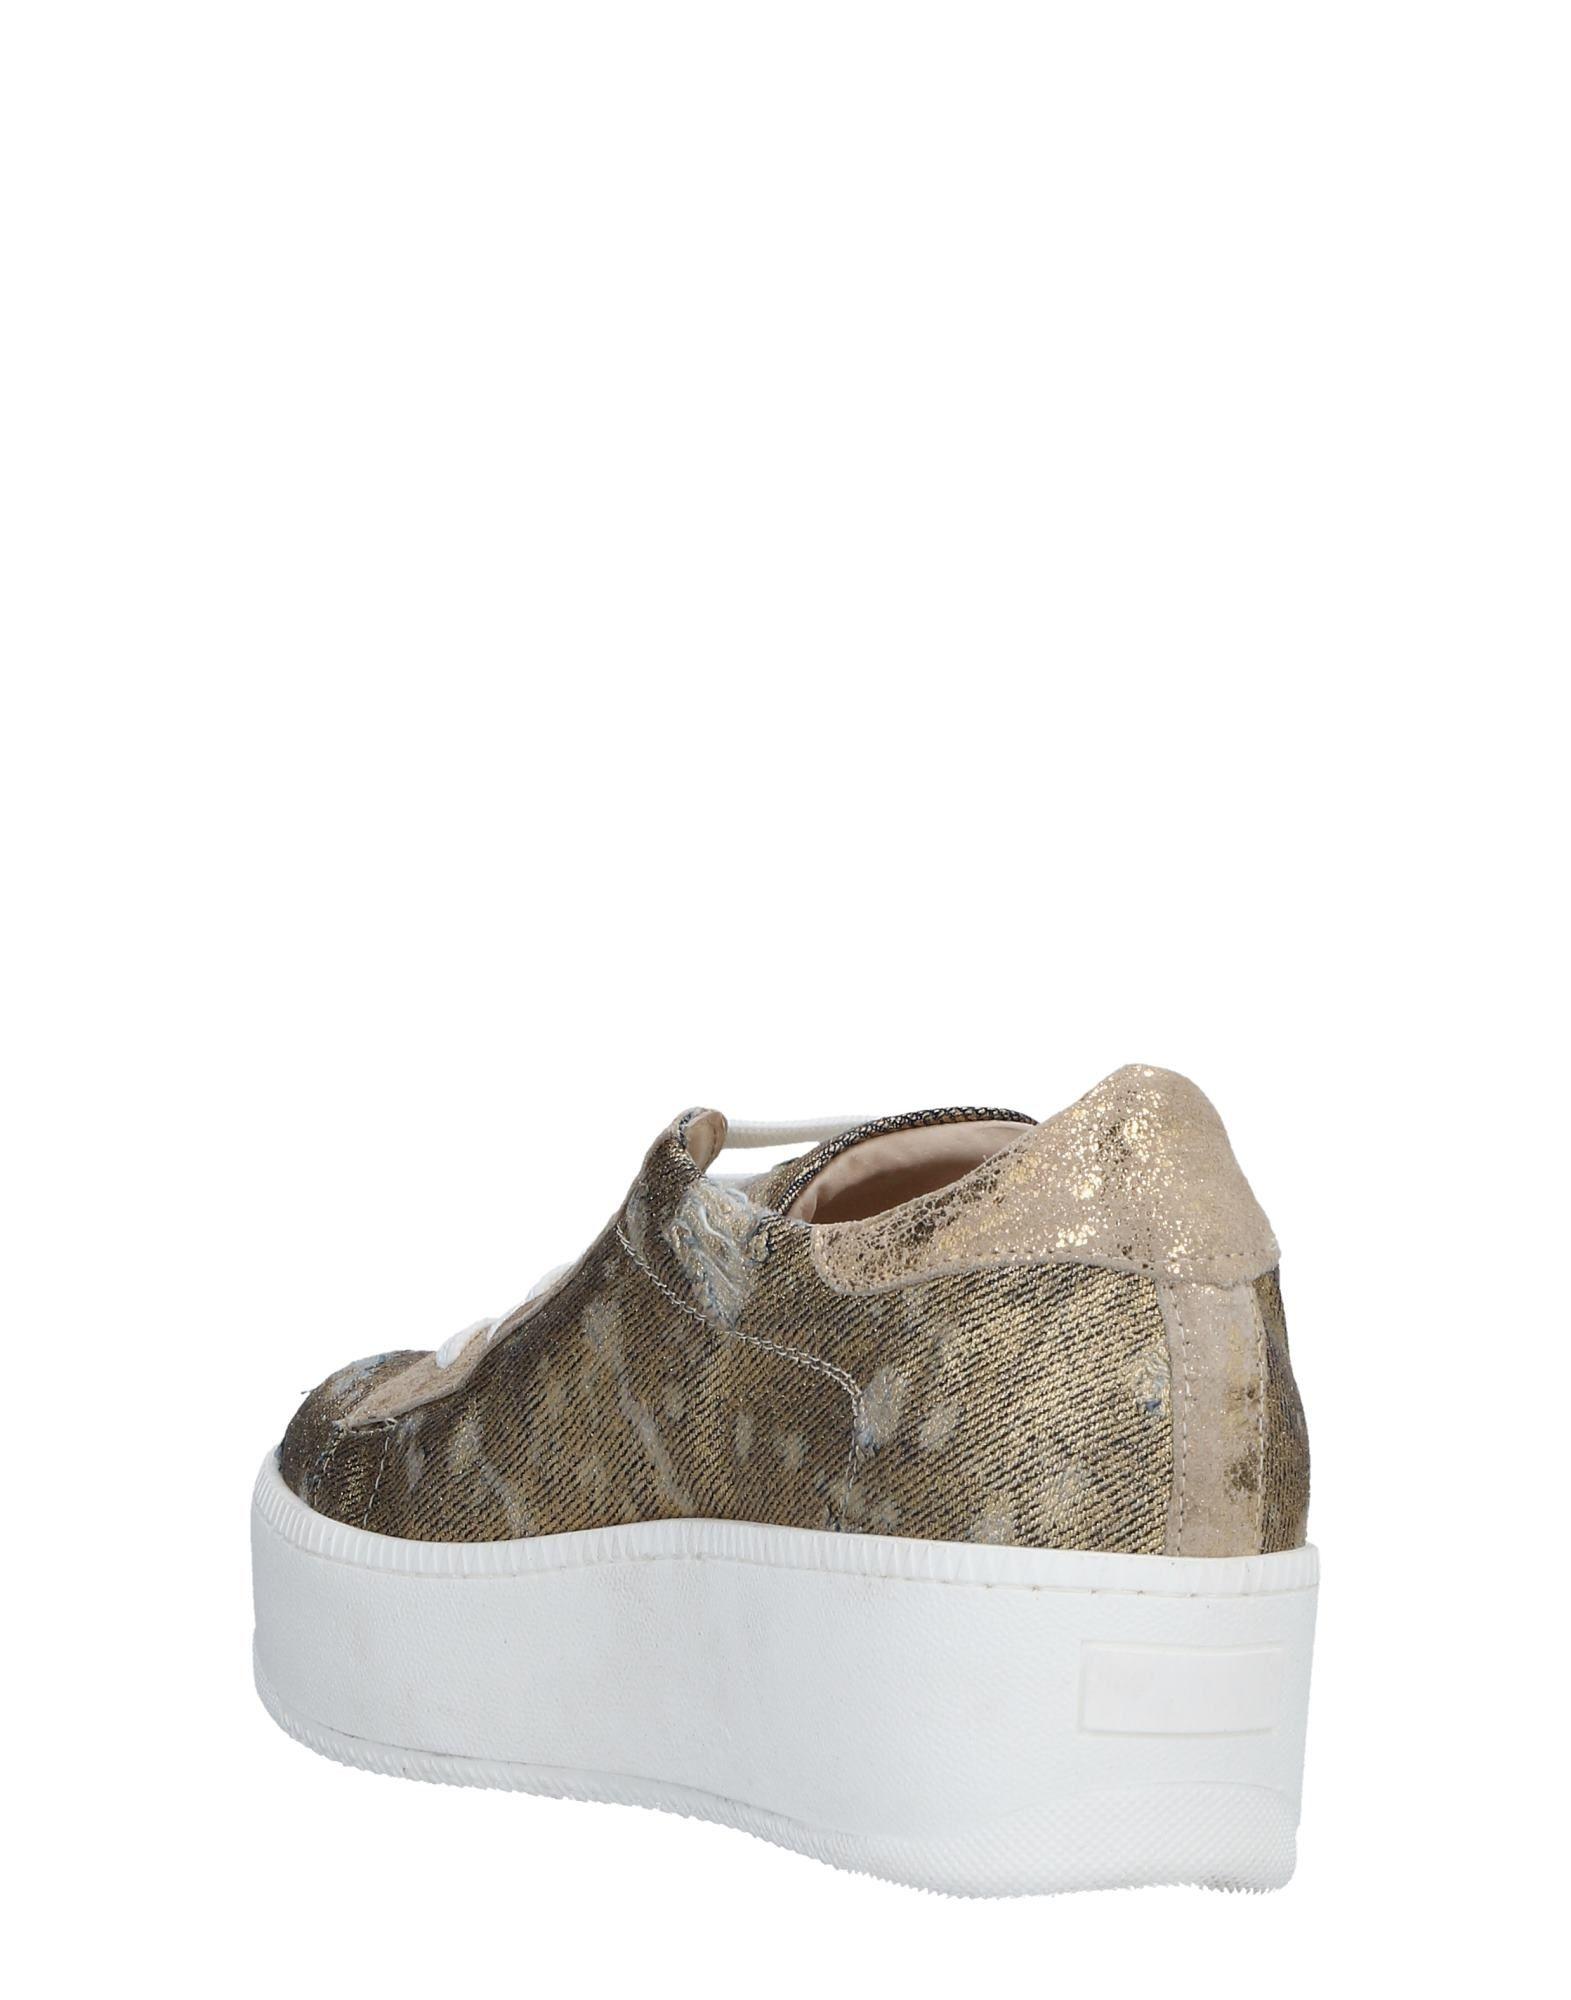 Divine Follie Sneakers Damen  11512013WB Gute Qualität beliebte beliebte beliebte Schuhe c428c4